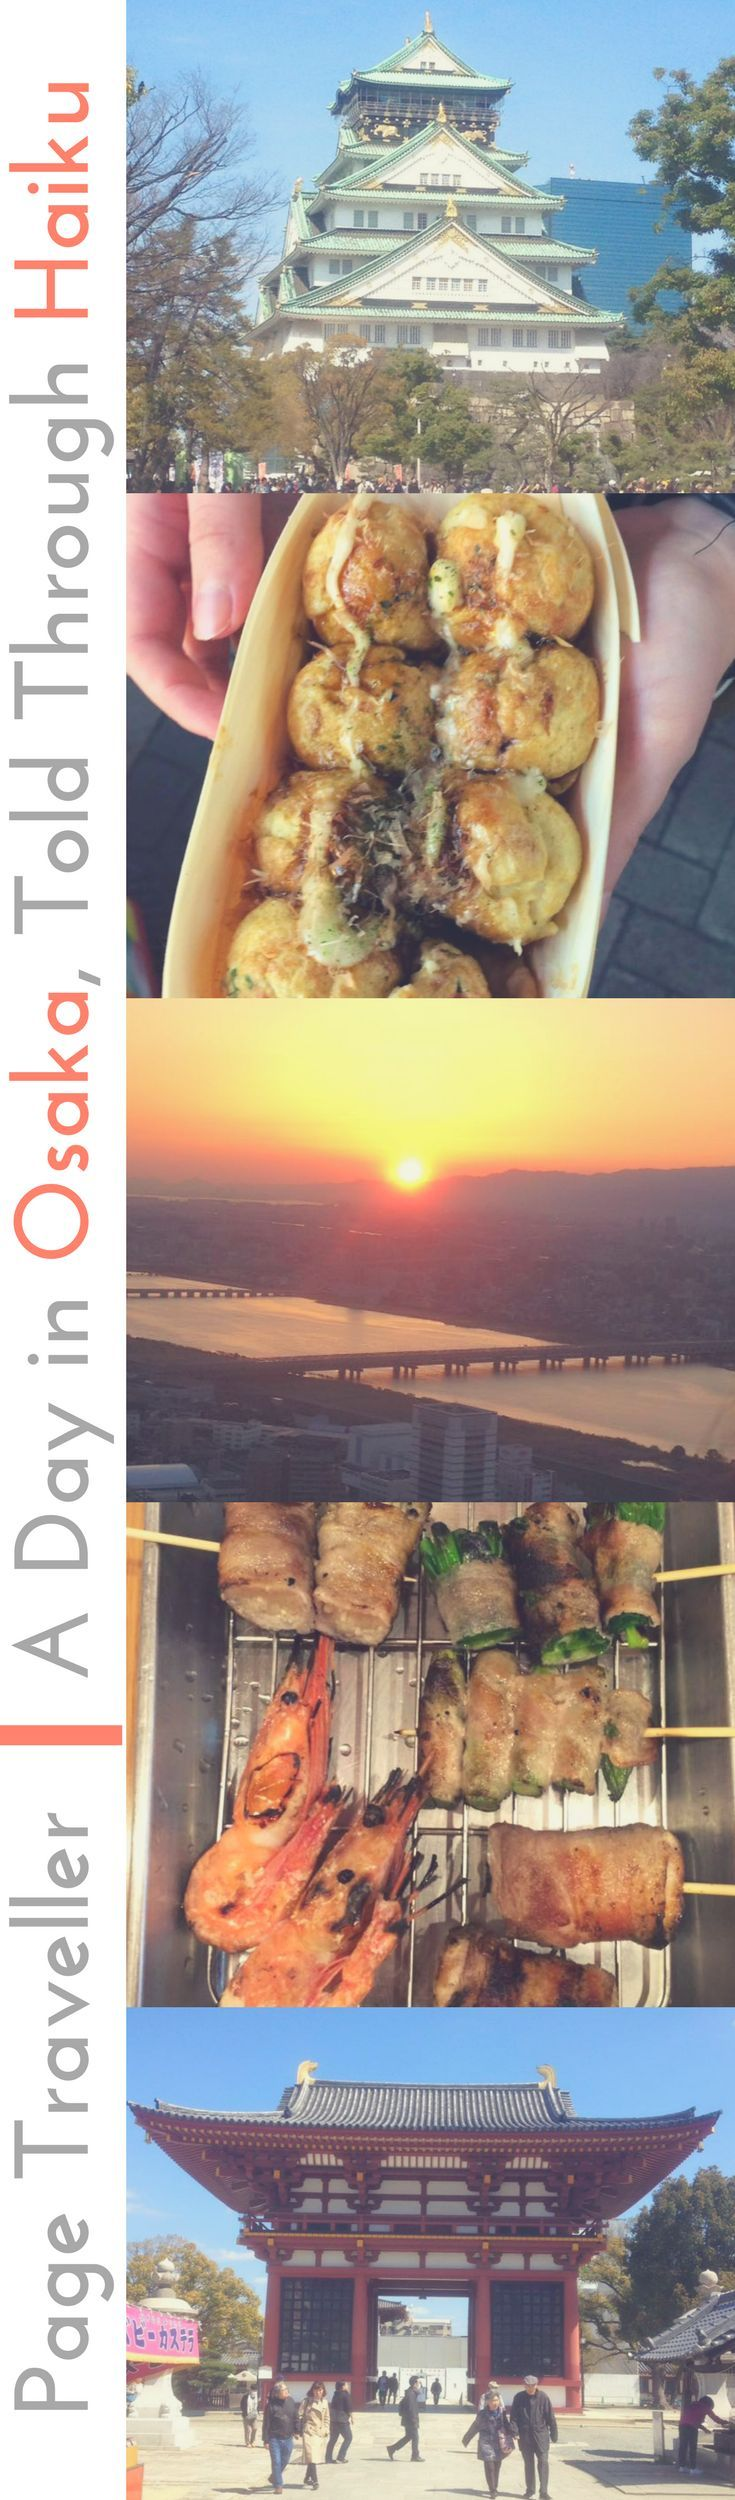 An Osaka Day, Told Through The Medium Of, Japanese Haiku. Here's my guide to exploring Osaka, Japan, as told through Japanese poetry. Have fun reading this alternative Osaka travel guide! #Osaka #Japan #Japanese #haiku #poetry #poem #travel #travelblogger #travelblog #traveltips #travelersnotebook #traveladdict #wanderlust #asia #traveller #travelling #backpacking #backpacker #globetrotter #travelguide #travelhacks #travelgoals #travelgram #traveling #traveljournal #travelmore…